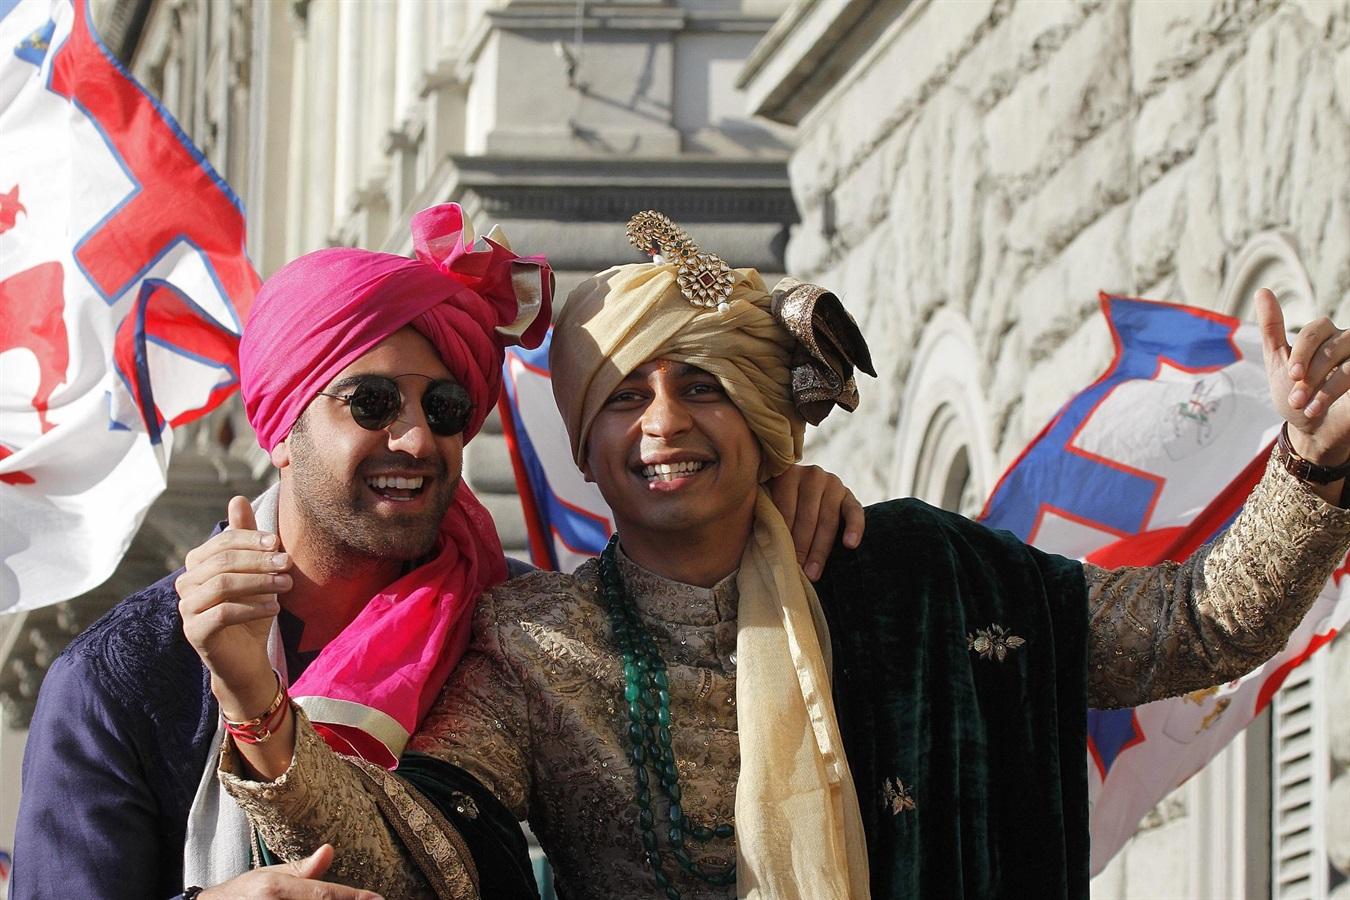 Nozze indiane: Firenze 'invasa' da musica